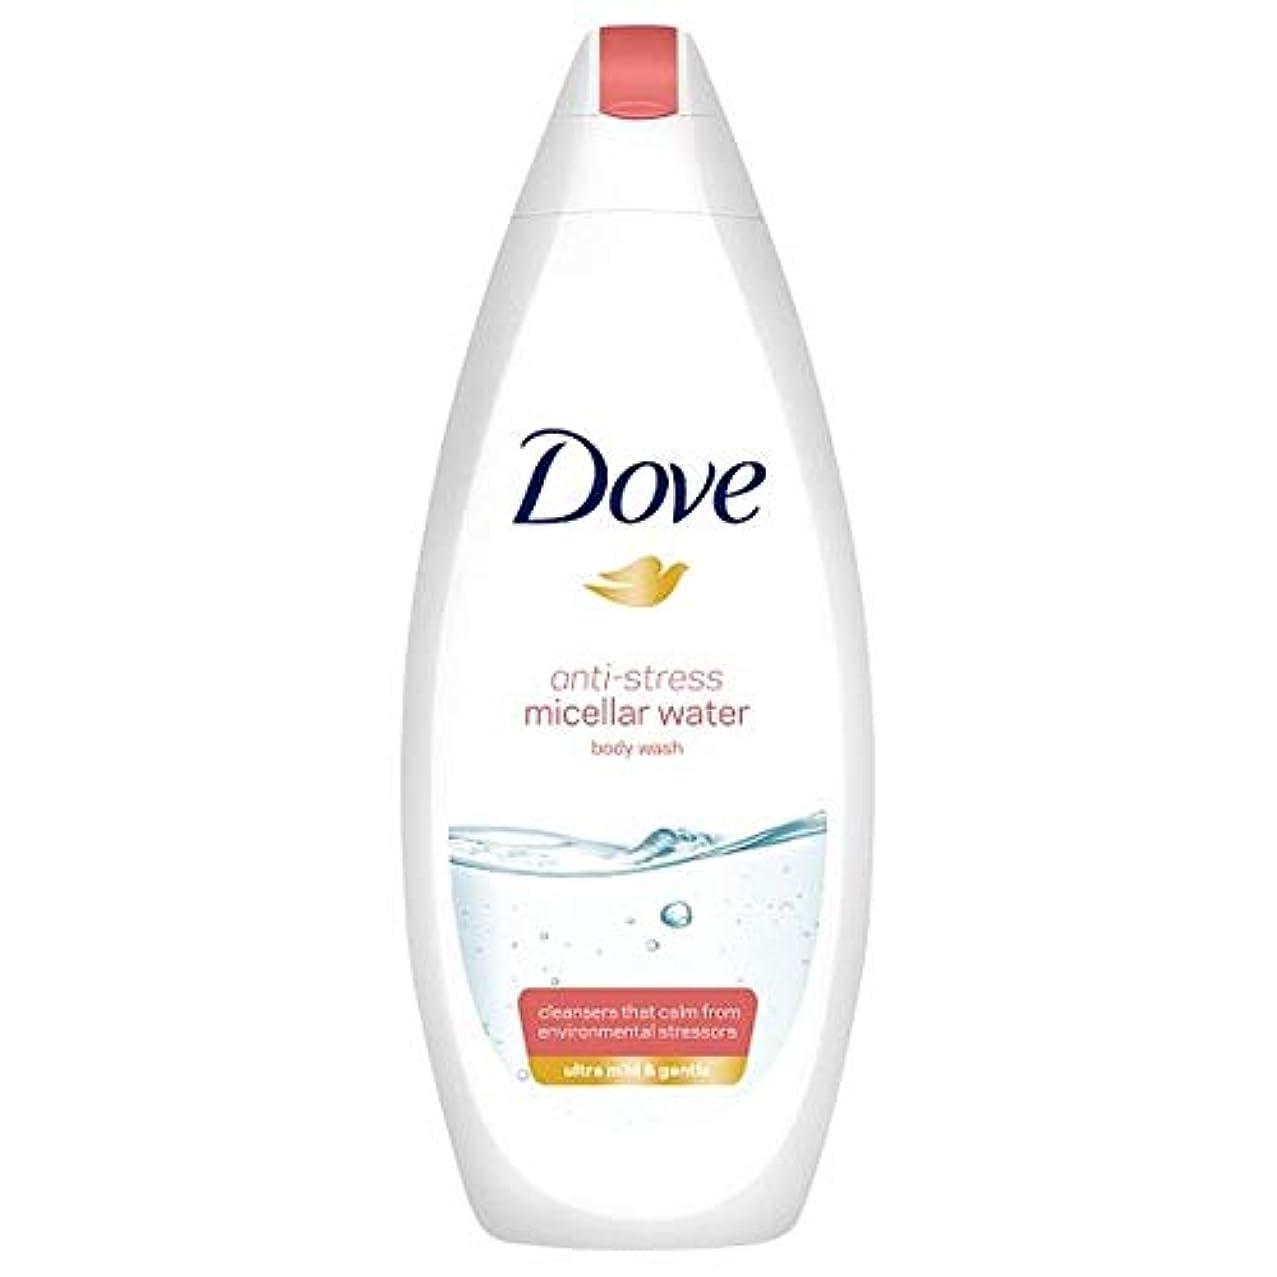 [Dove] 鳩ミセルボディウォッシュ抗ストレス500ミリリットル - Dove Micellar Body Wash Anti Stress 500Ml [並行輸入品]